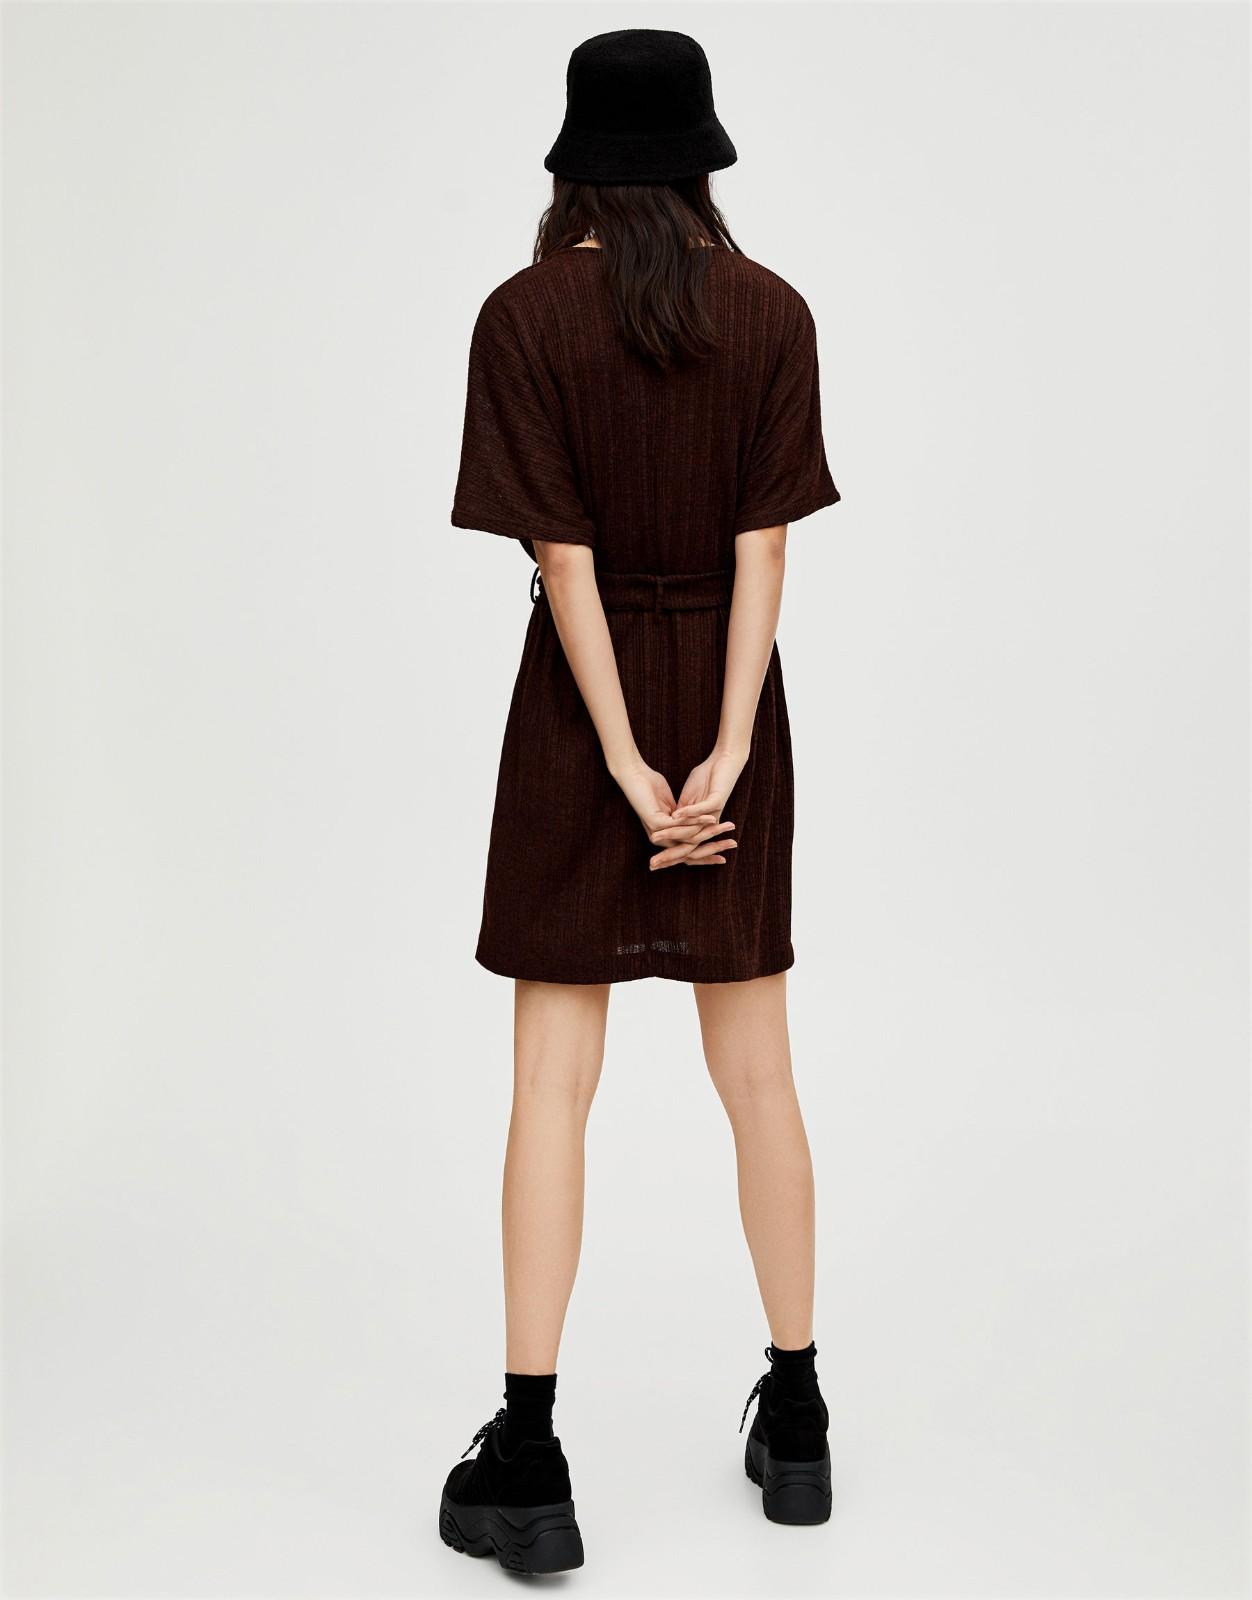 PULL&BEAR 09393396 女士收腰法式连衣裙